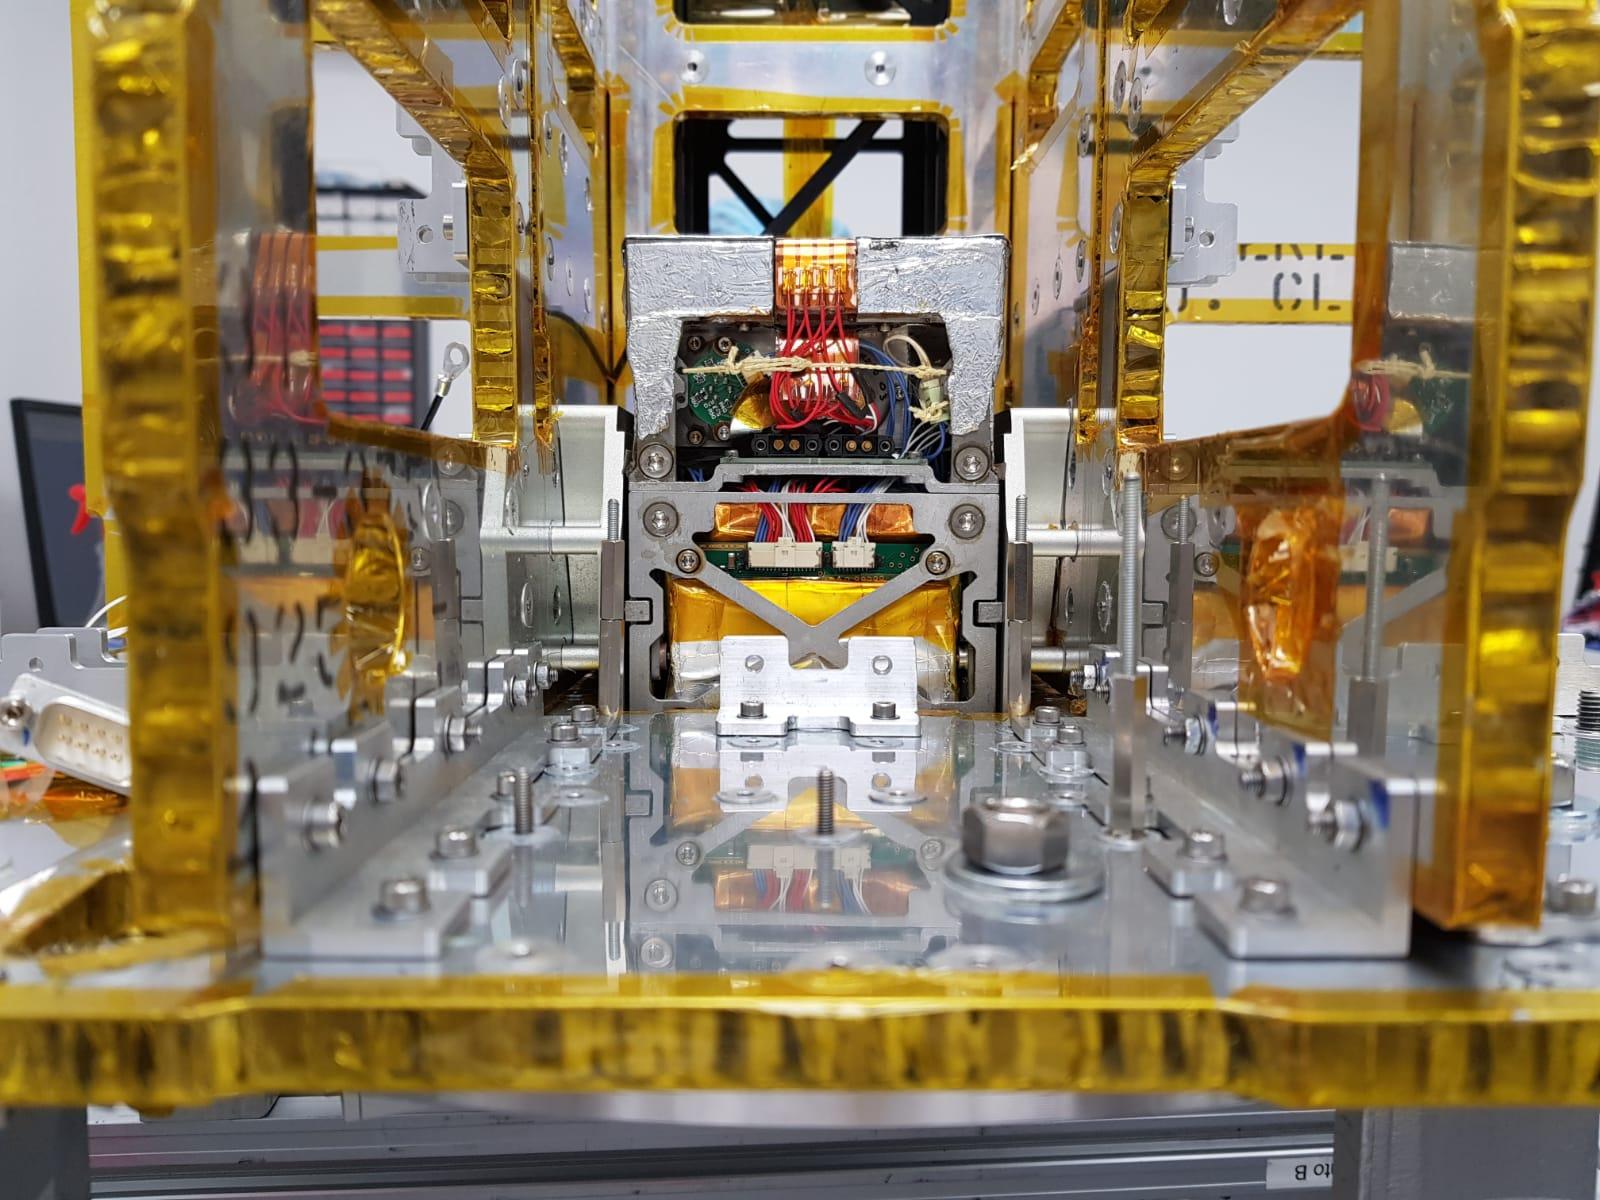 Il motore REGULUS, integrato nel dispenser UNISAT-7. Credits: T4i.